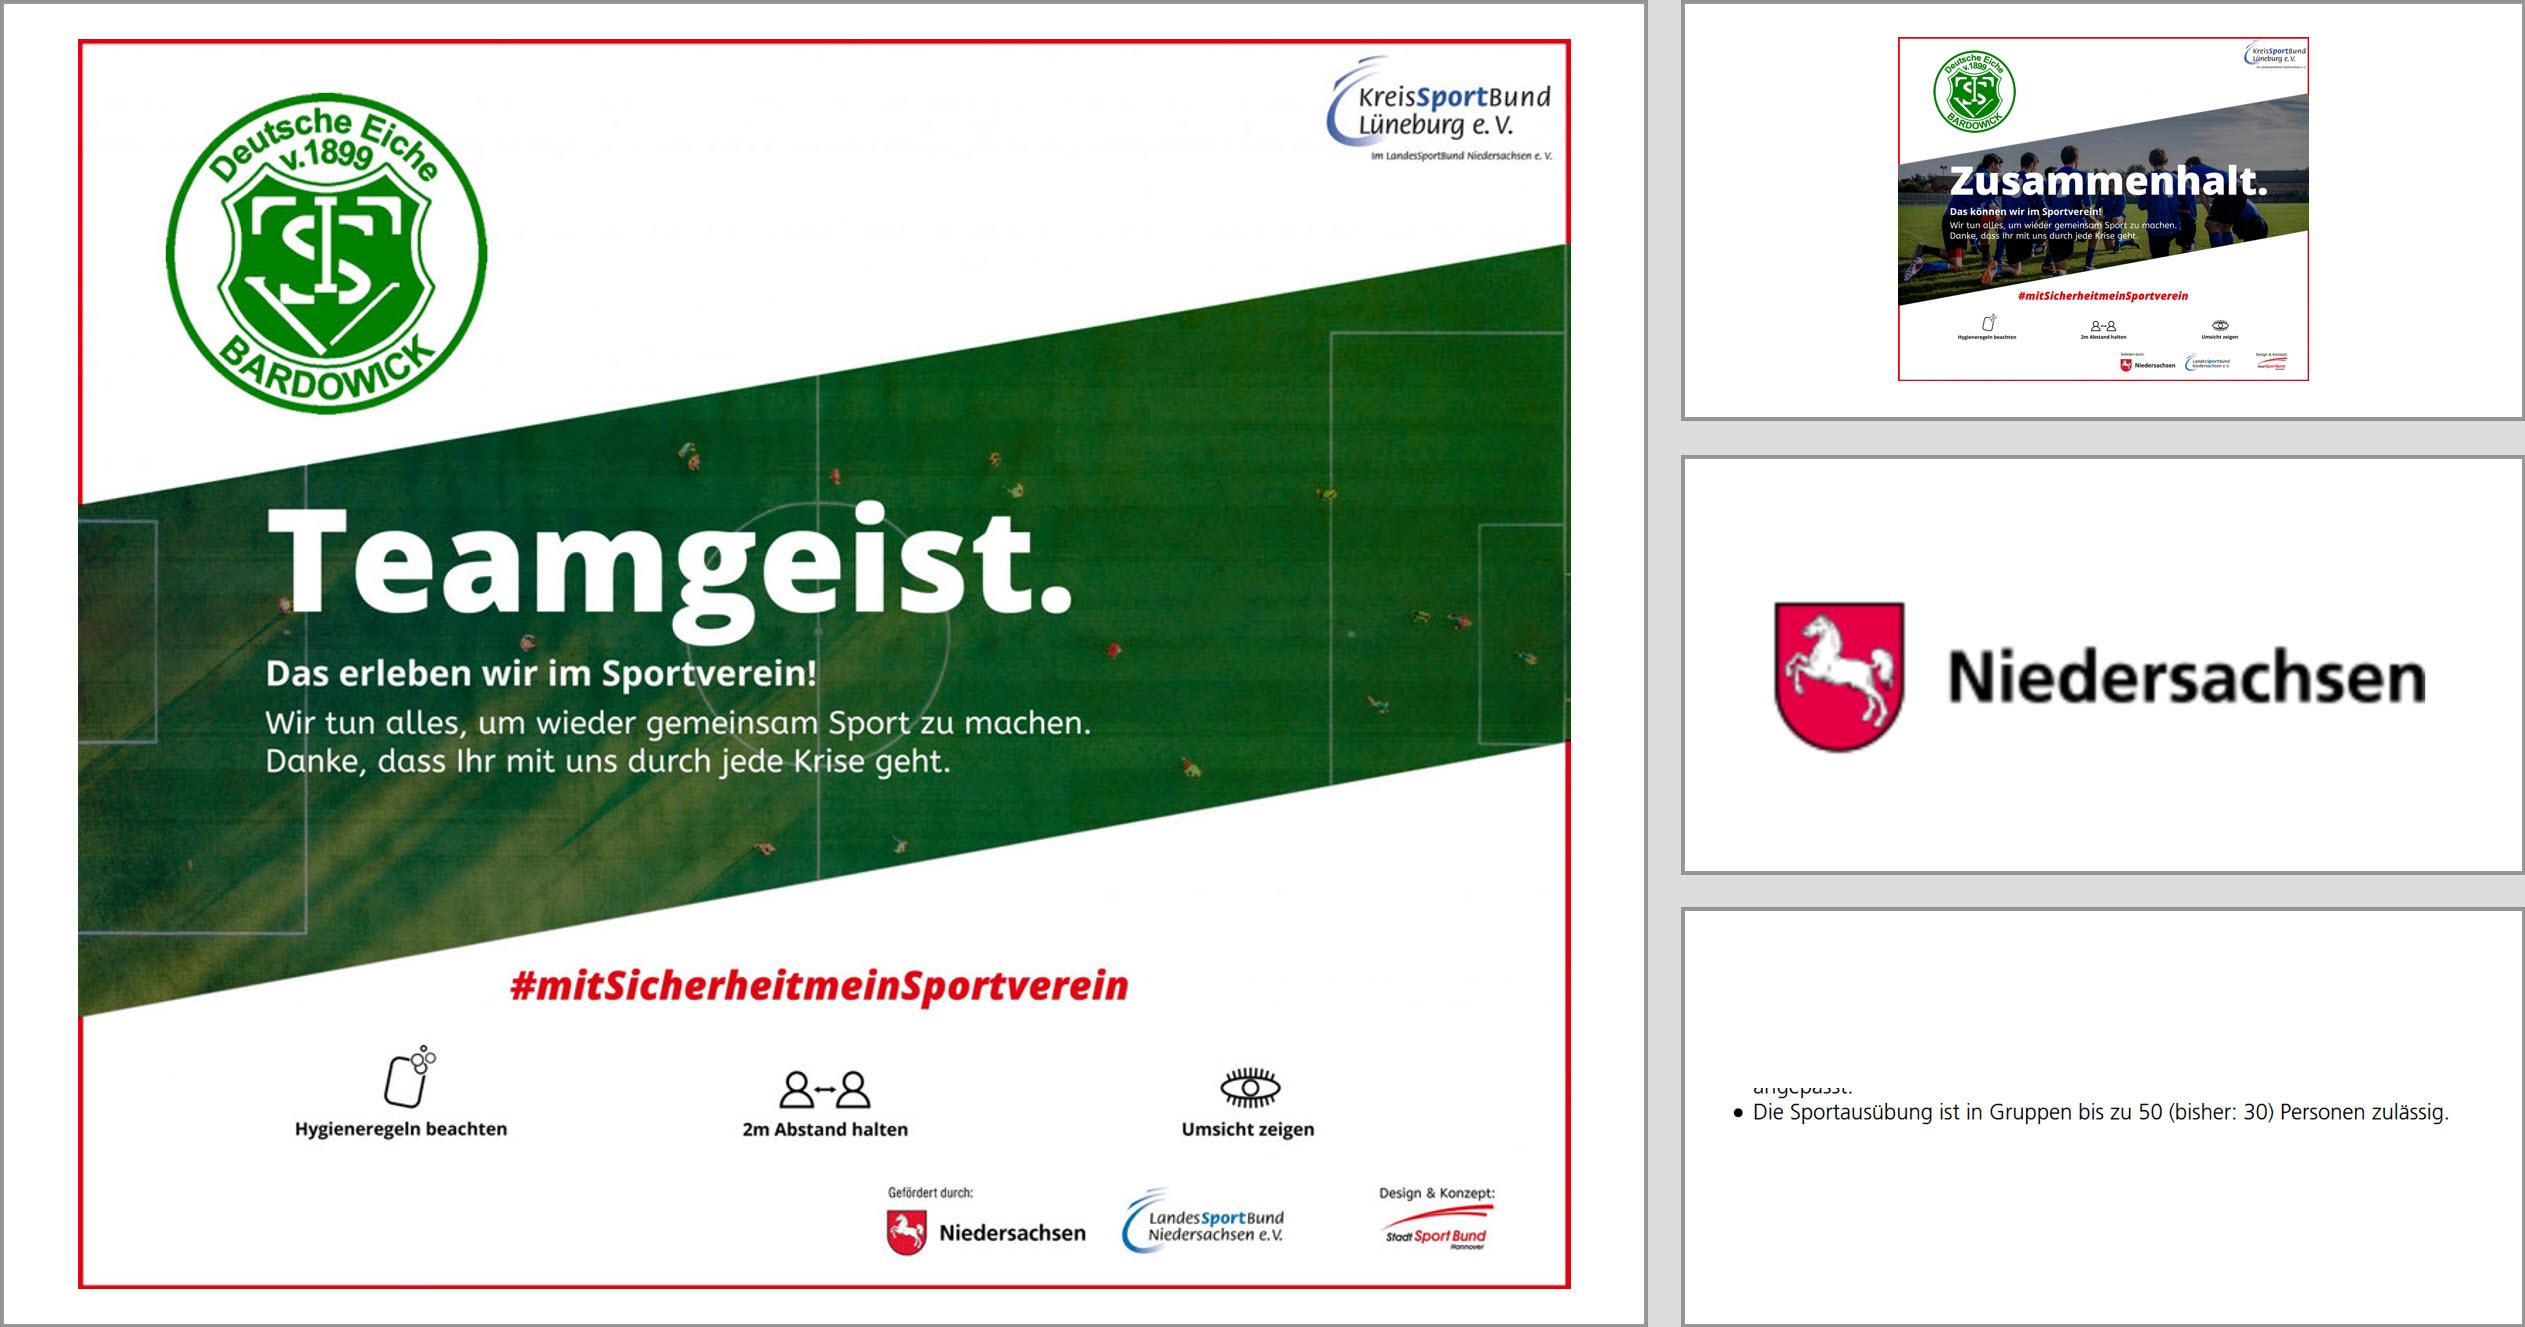 Neue Coronaverordnung: 30-Personen-Regelung überholt - Niedersachsen erlaubt Sport in Gruppen mit 50 Personen